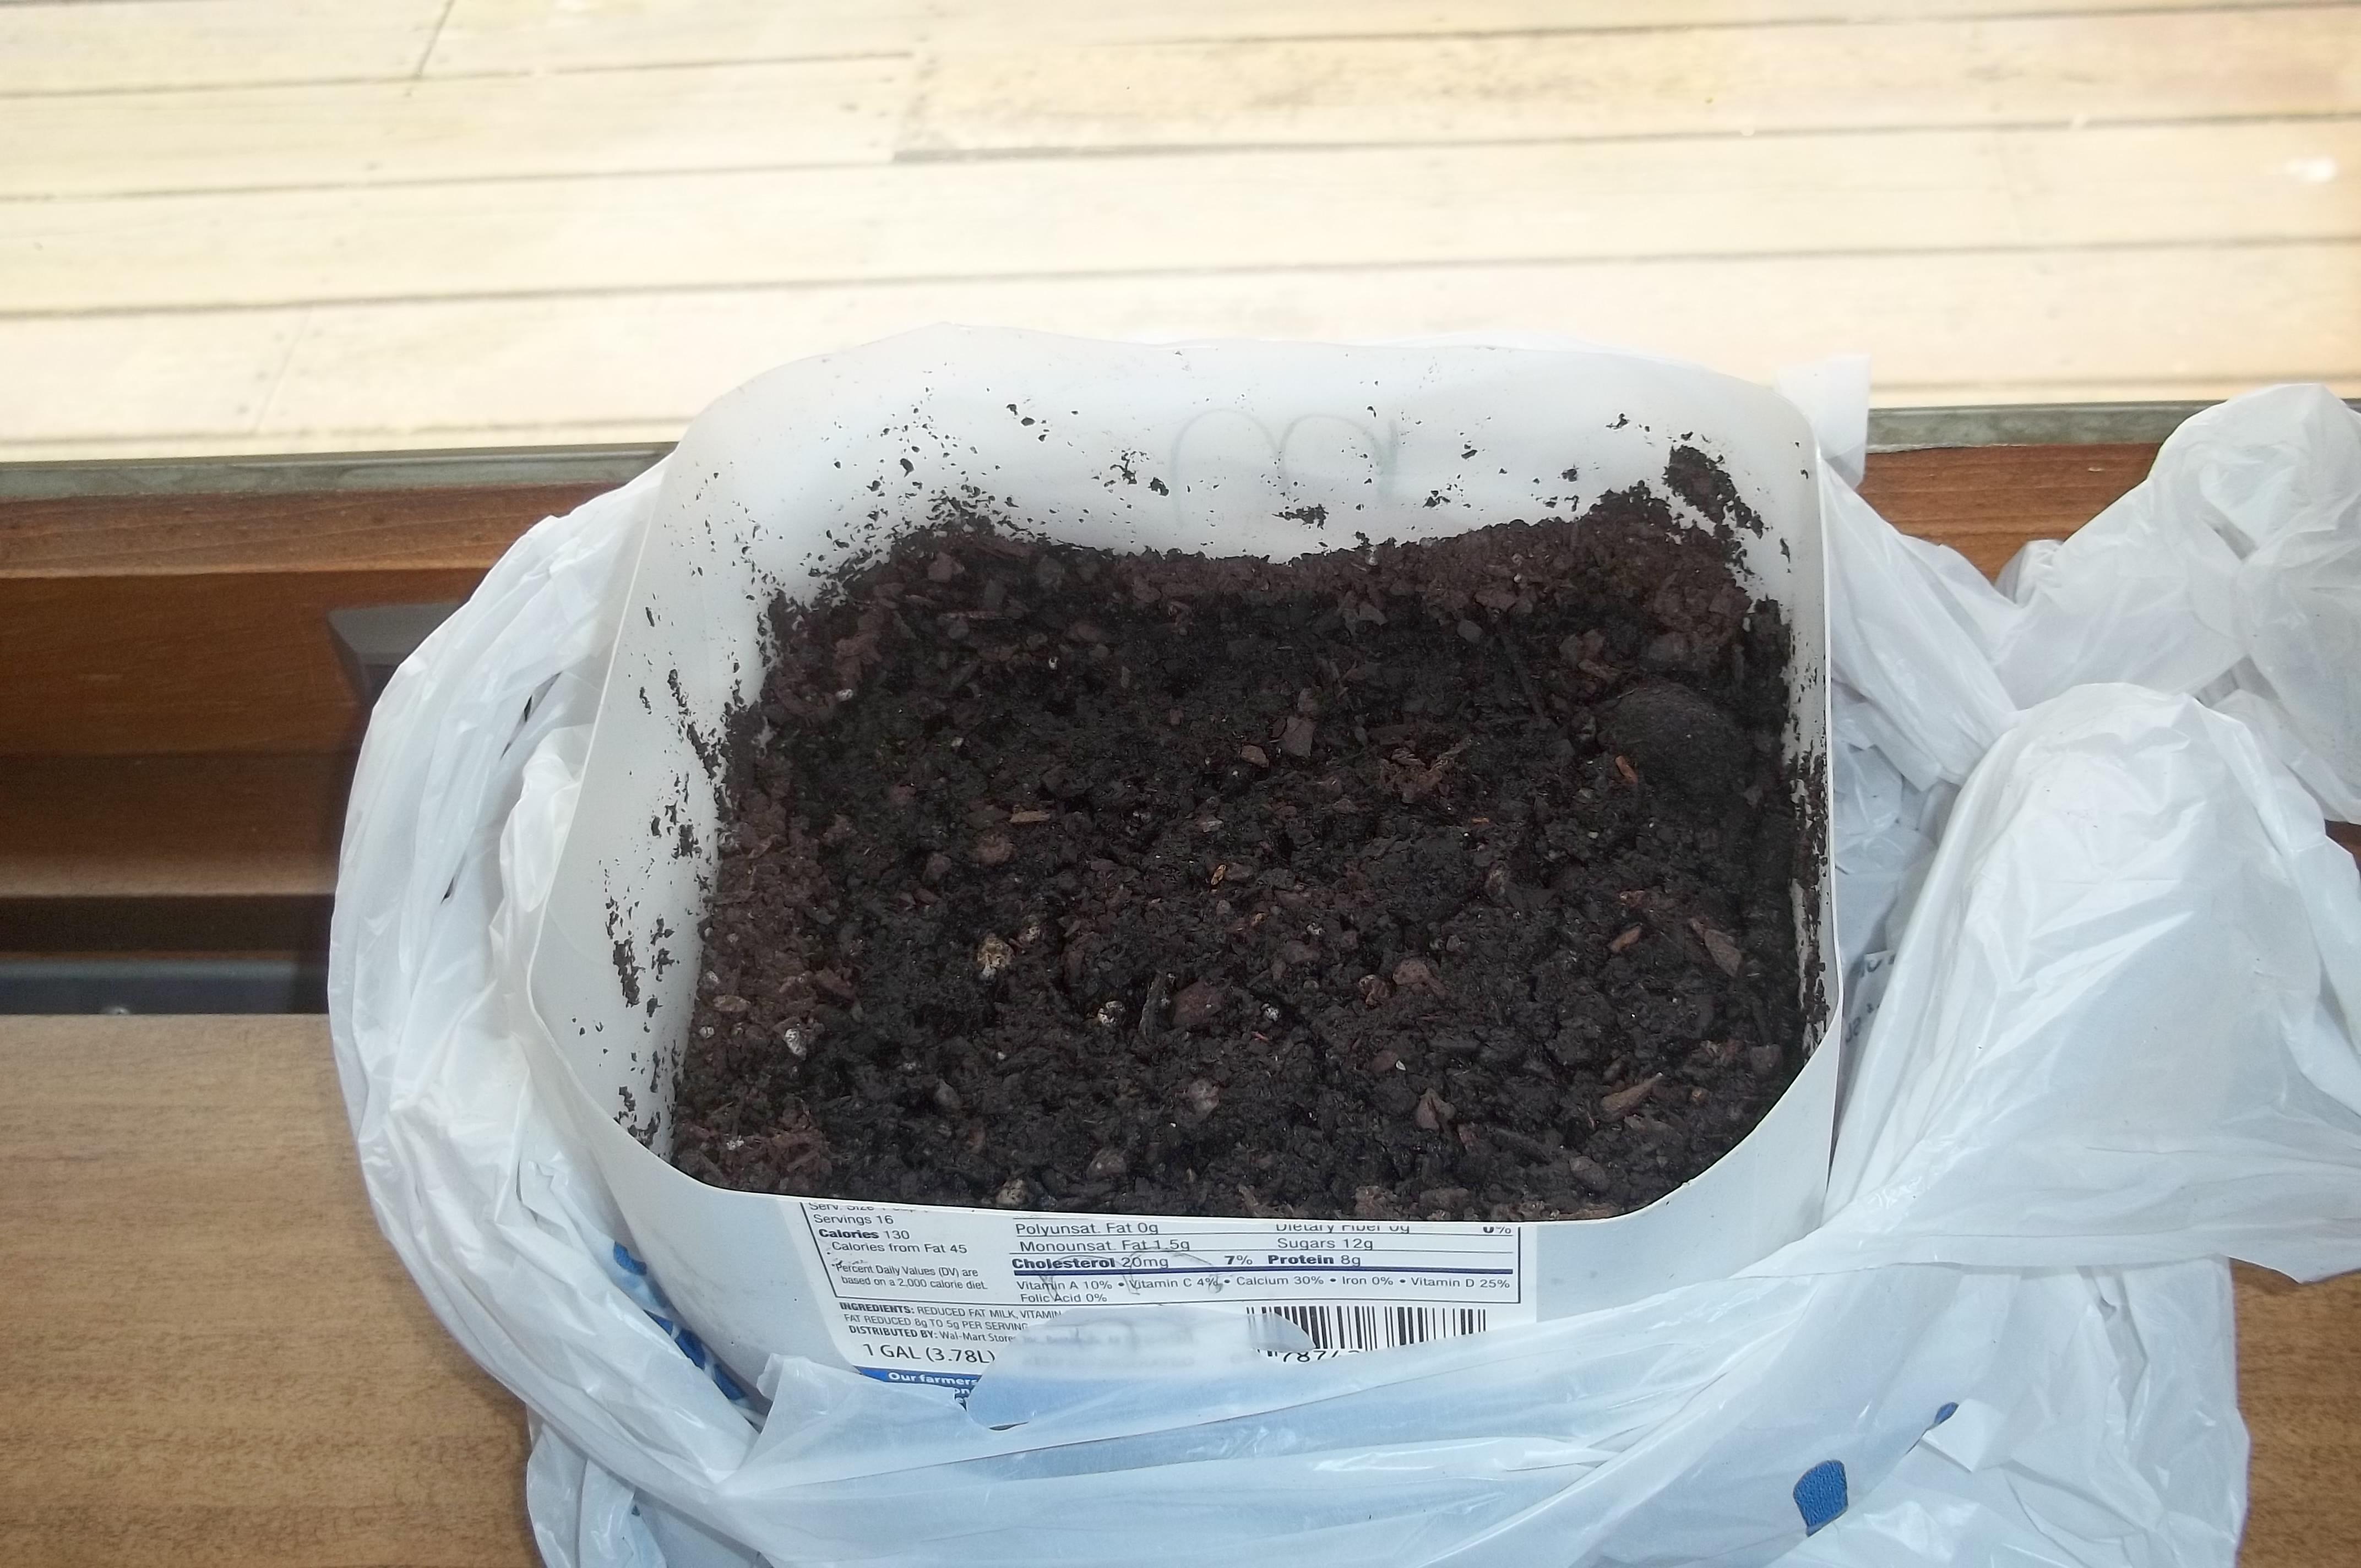 Cheap planters to start garden plants, or indoor garden.